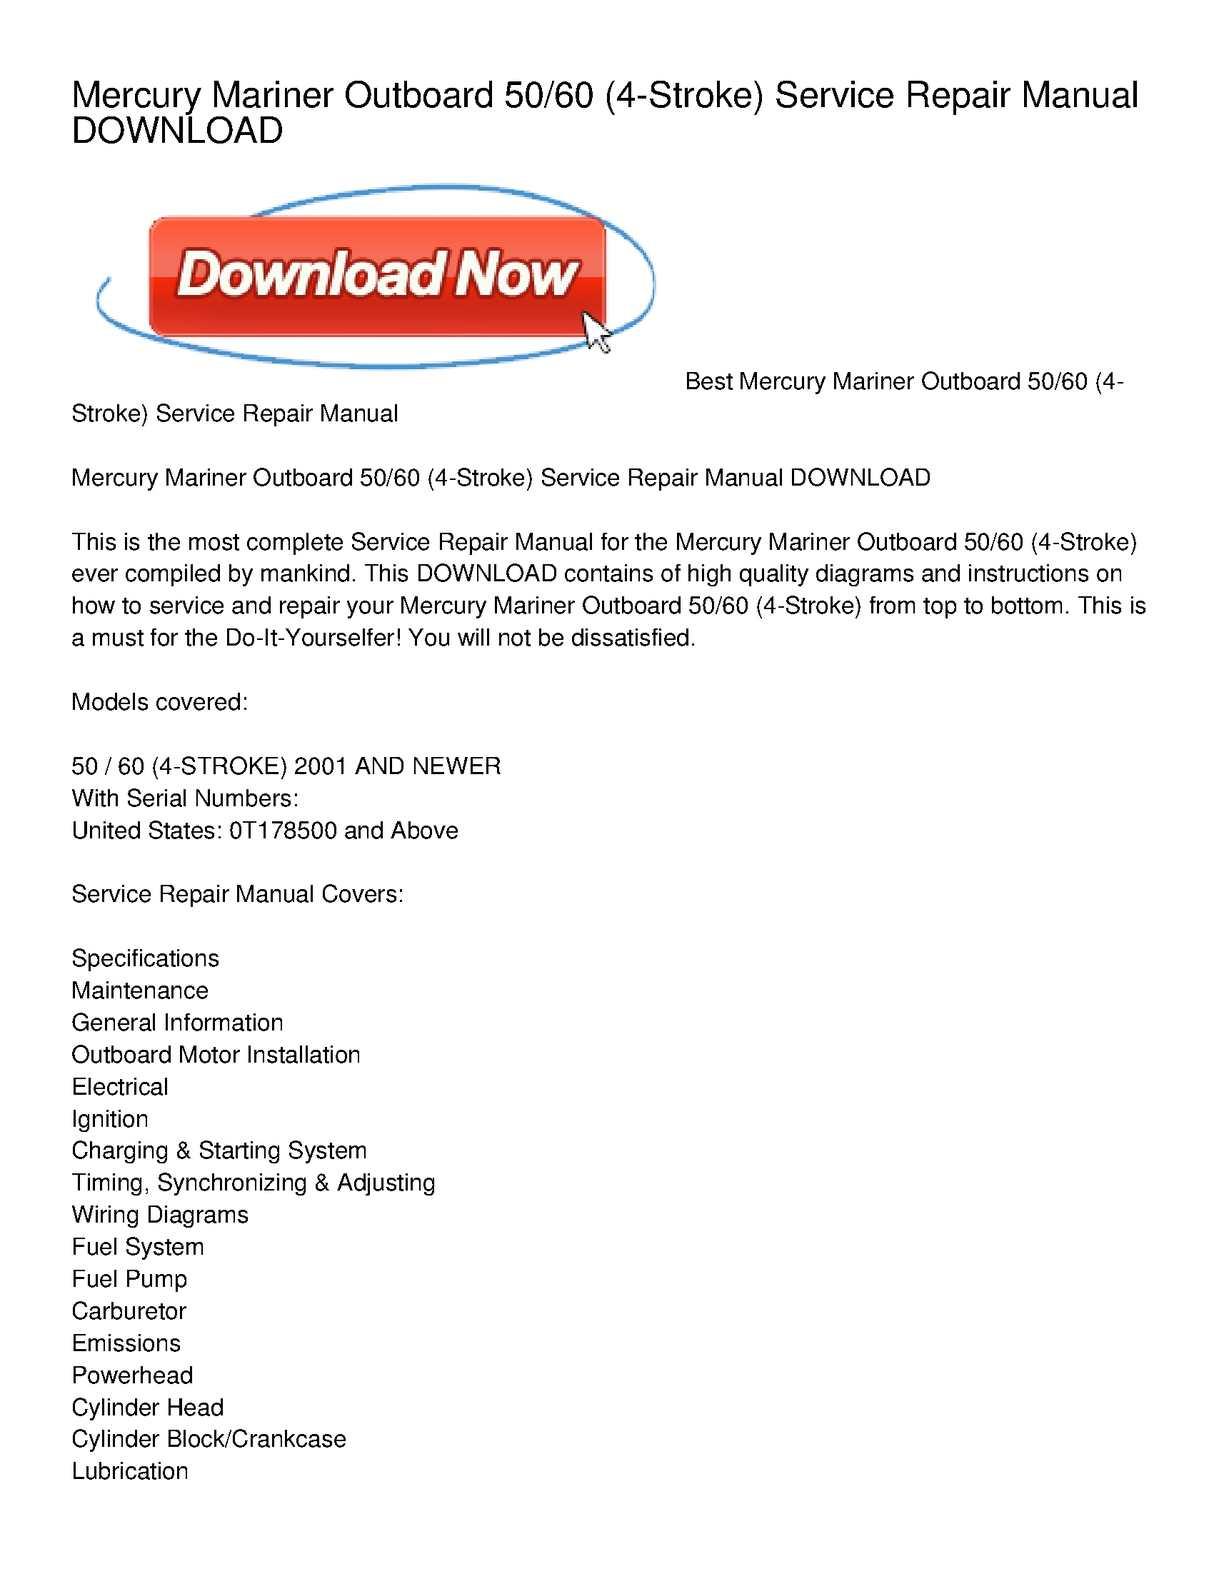 Calaméo - Mercury Mariner Outboard 50_60 (4-Stroke) Service Repair Manual  DOWNLOAD